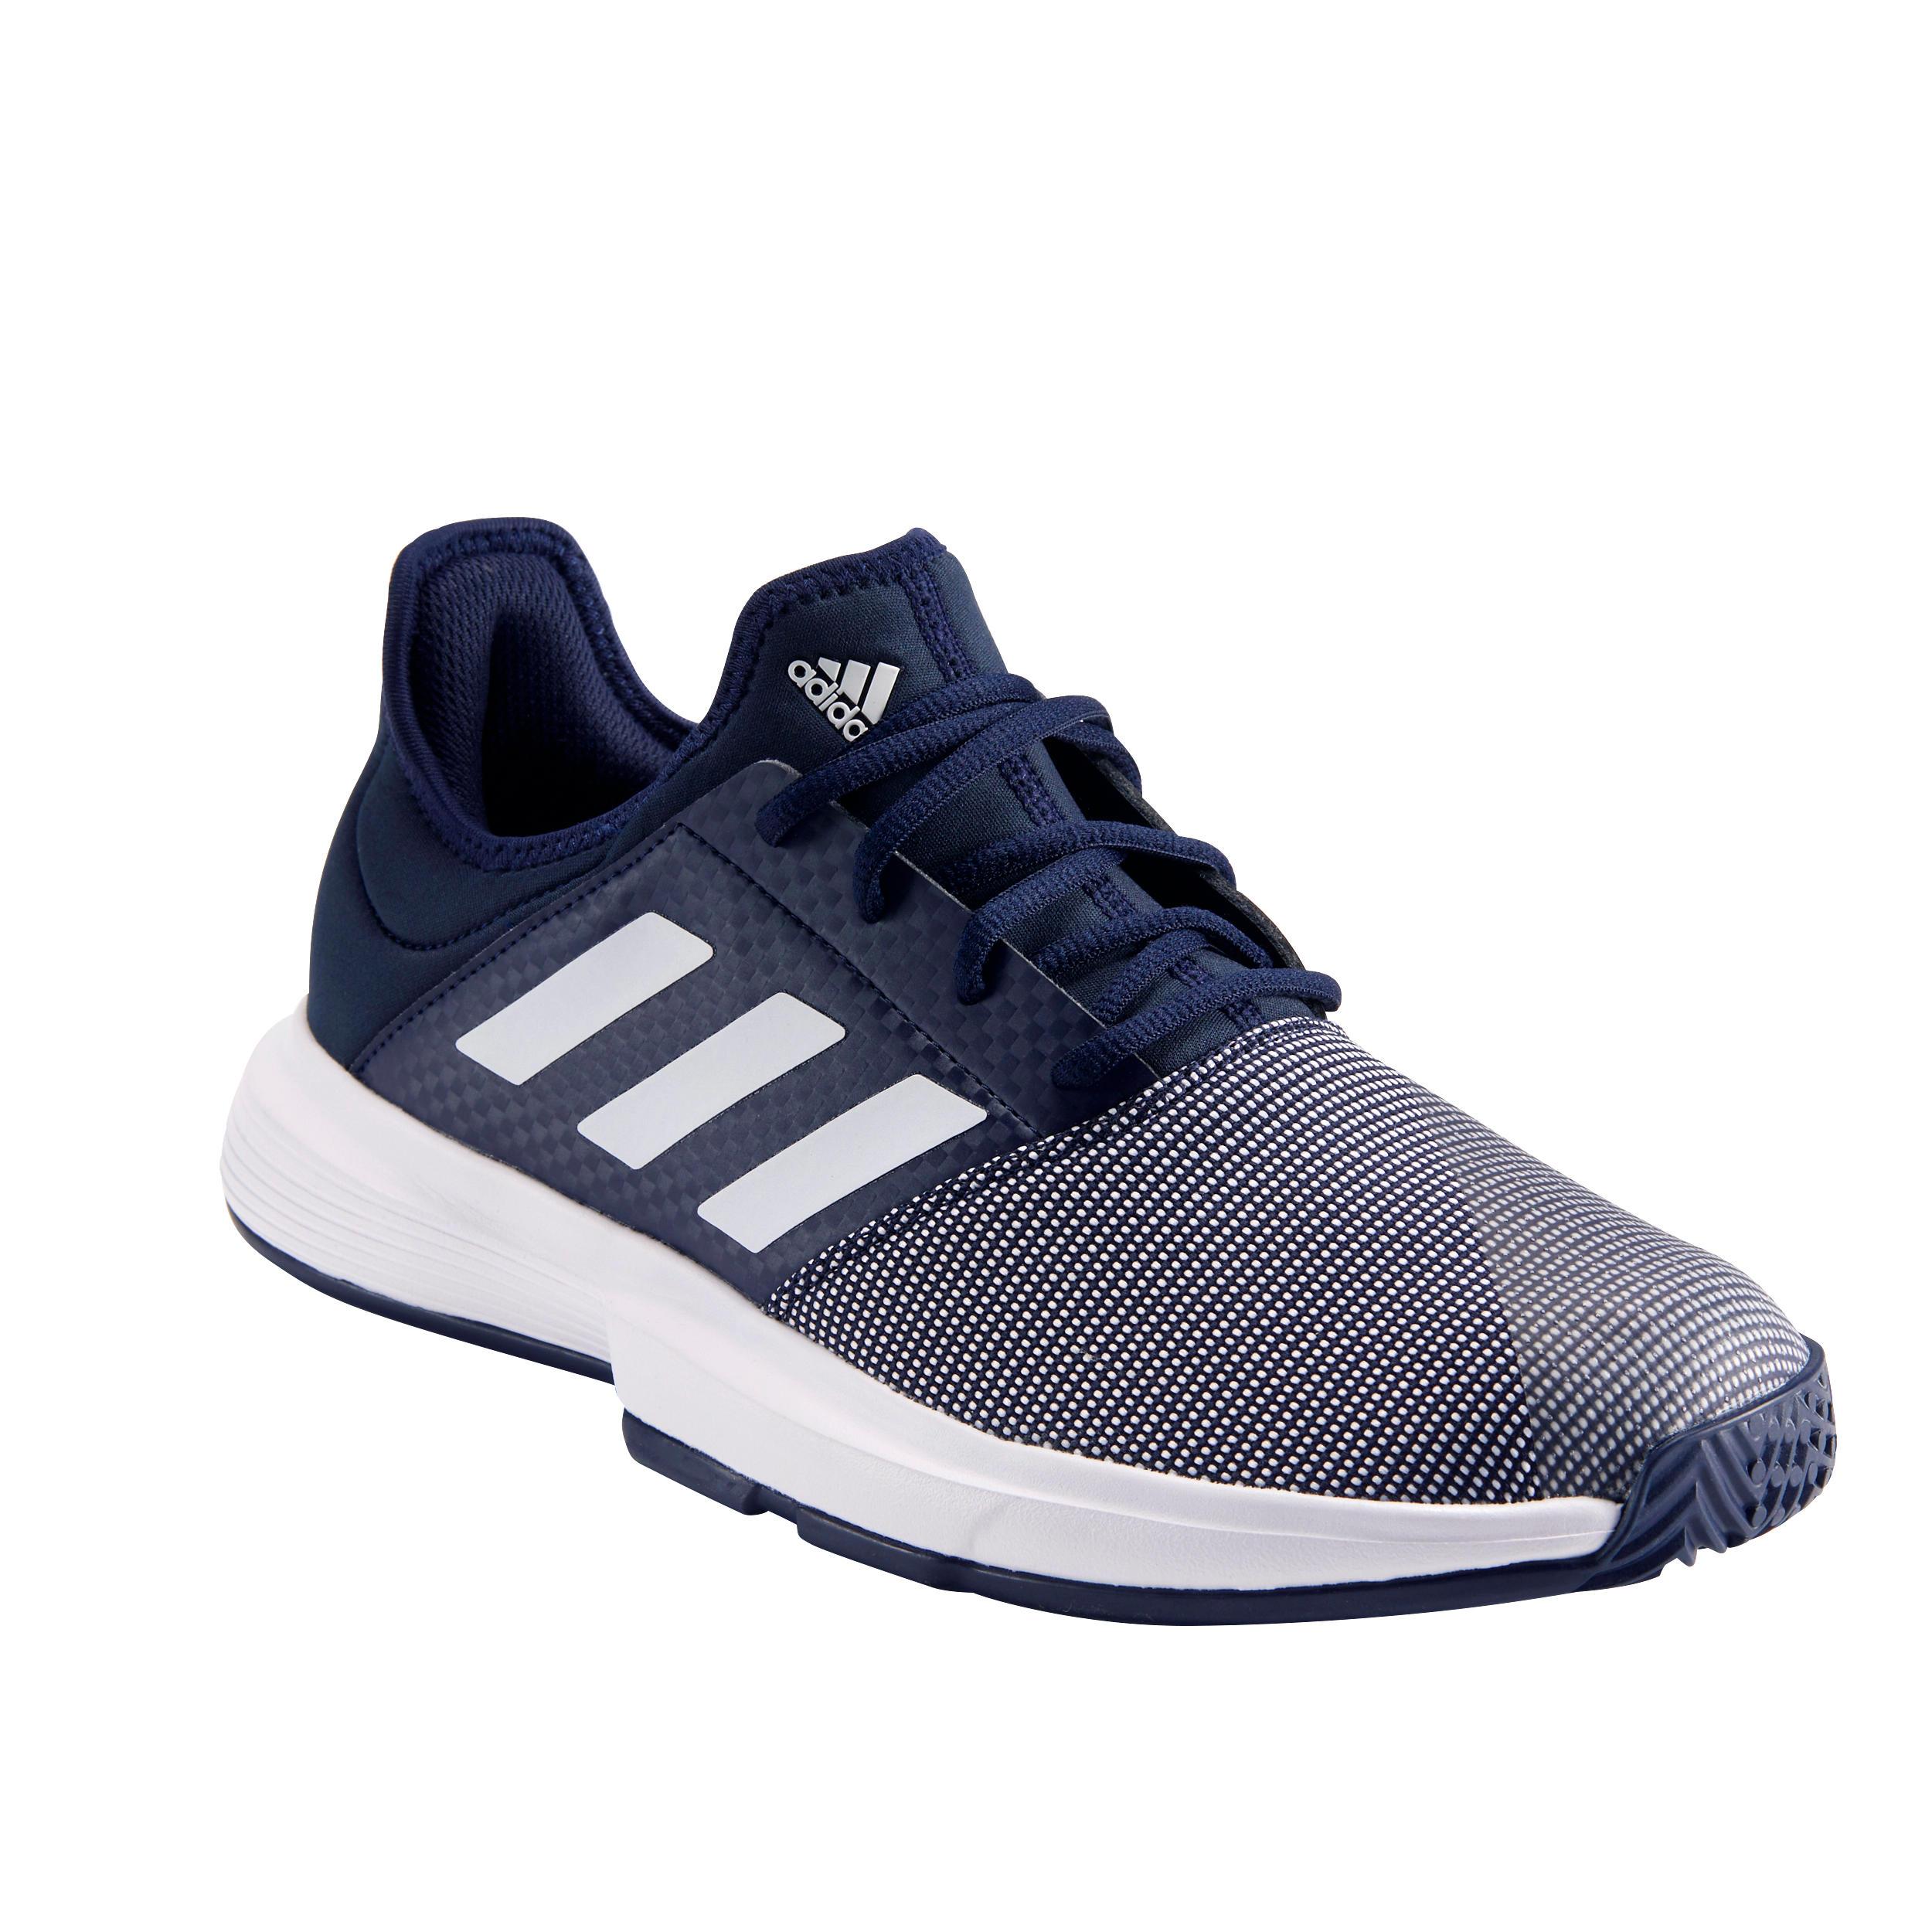 Încălțăminte Adidas GameCourt